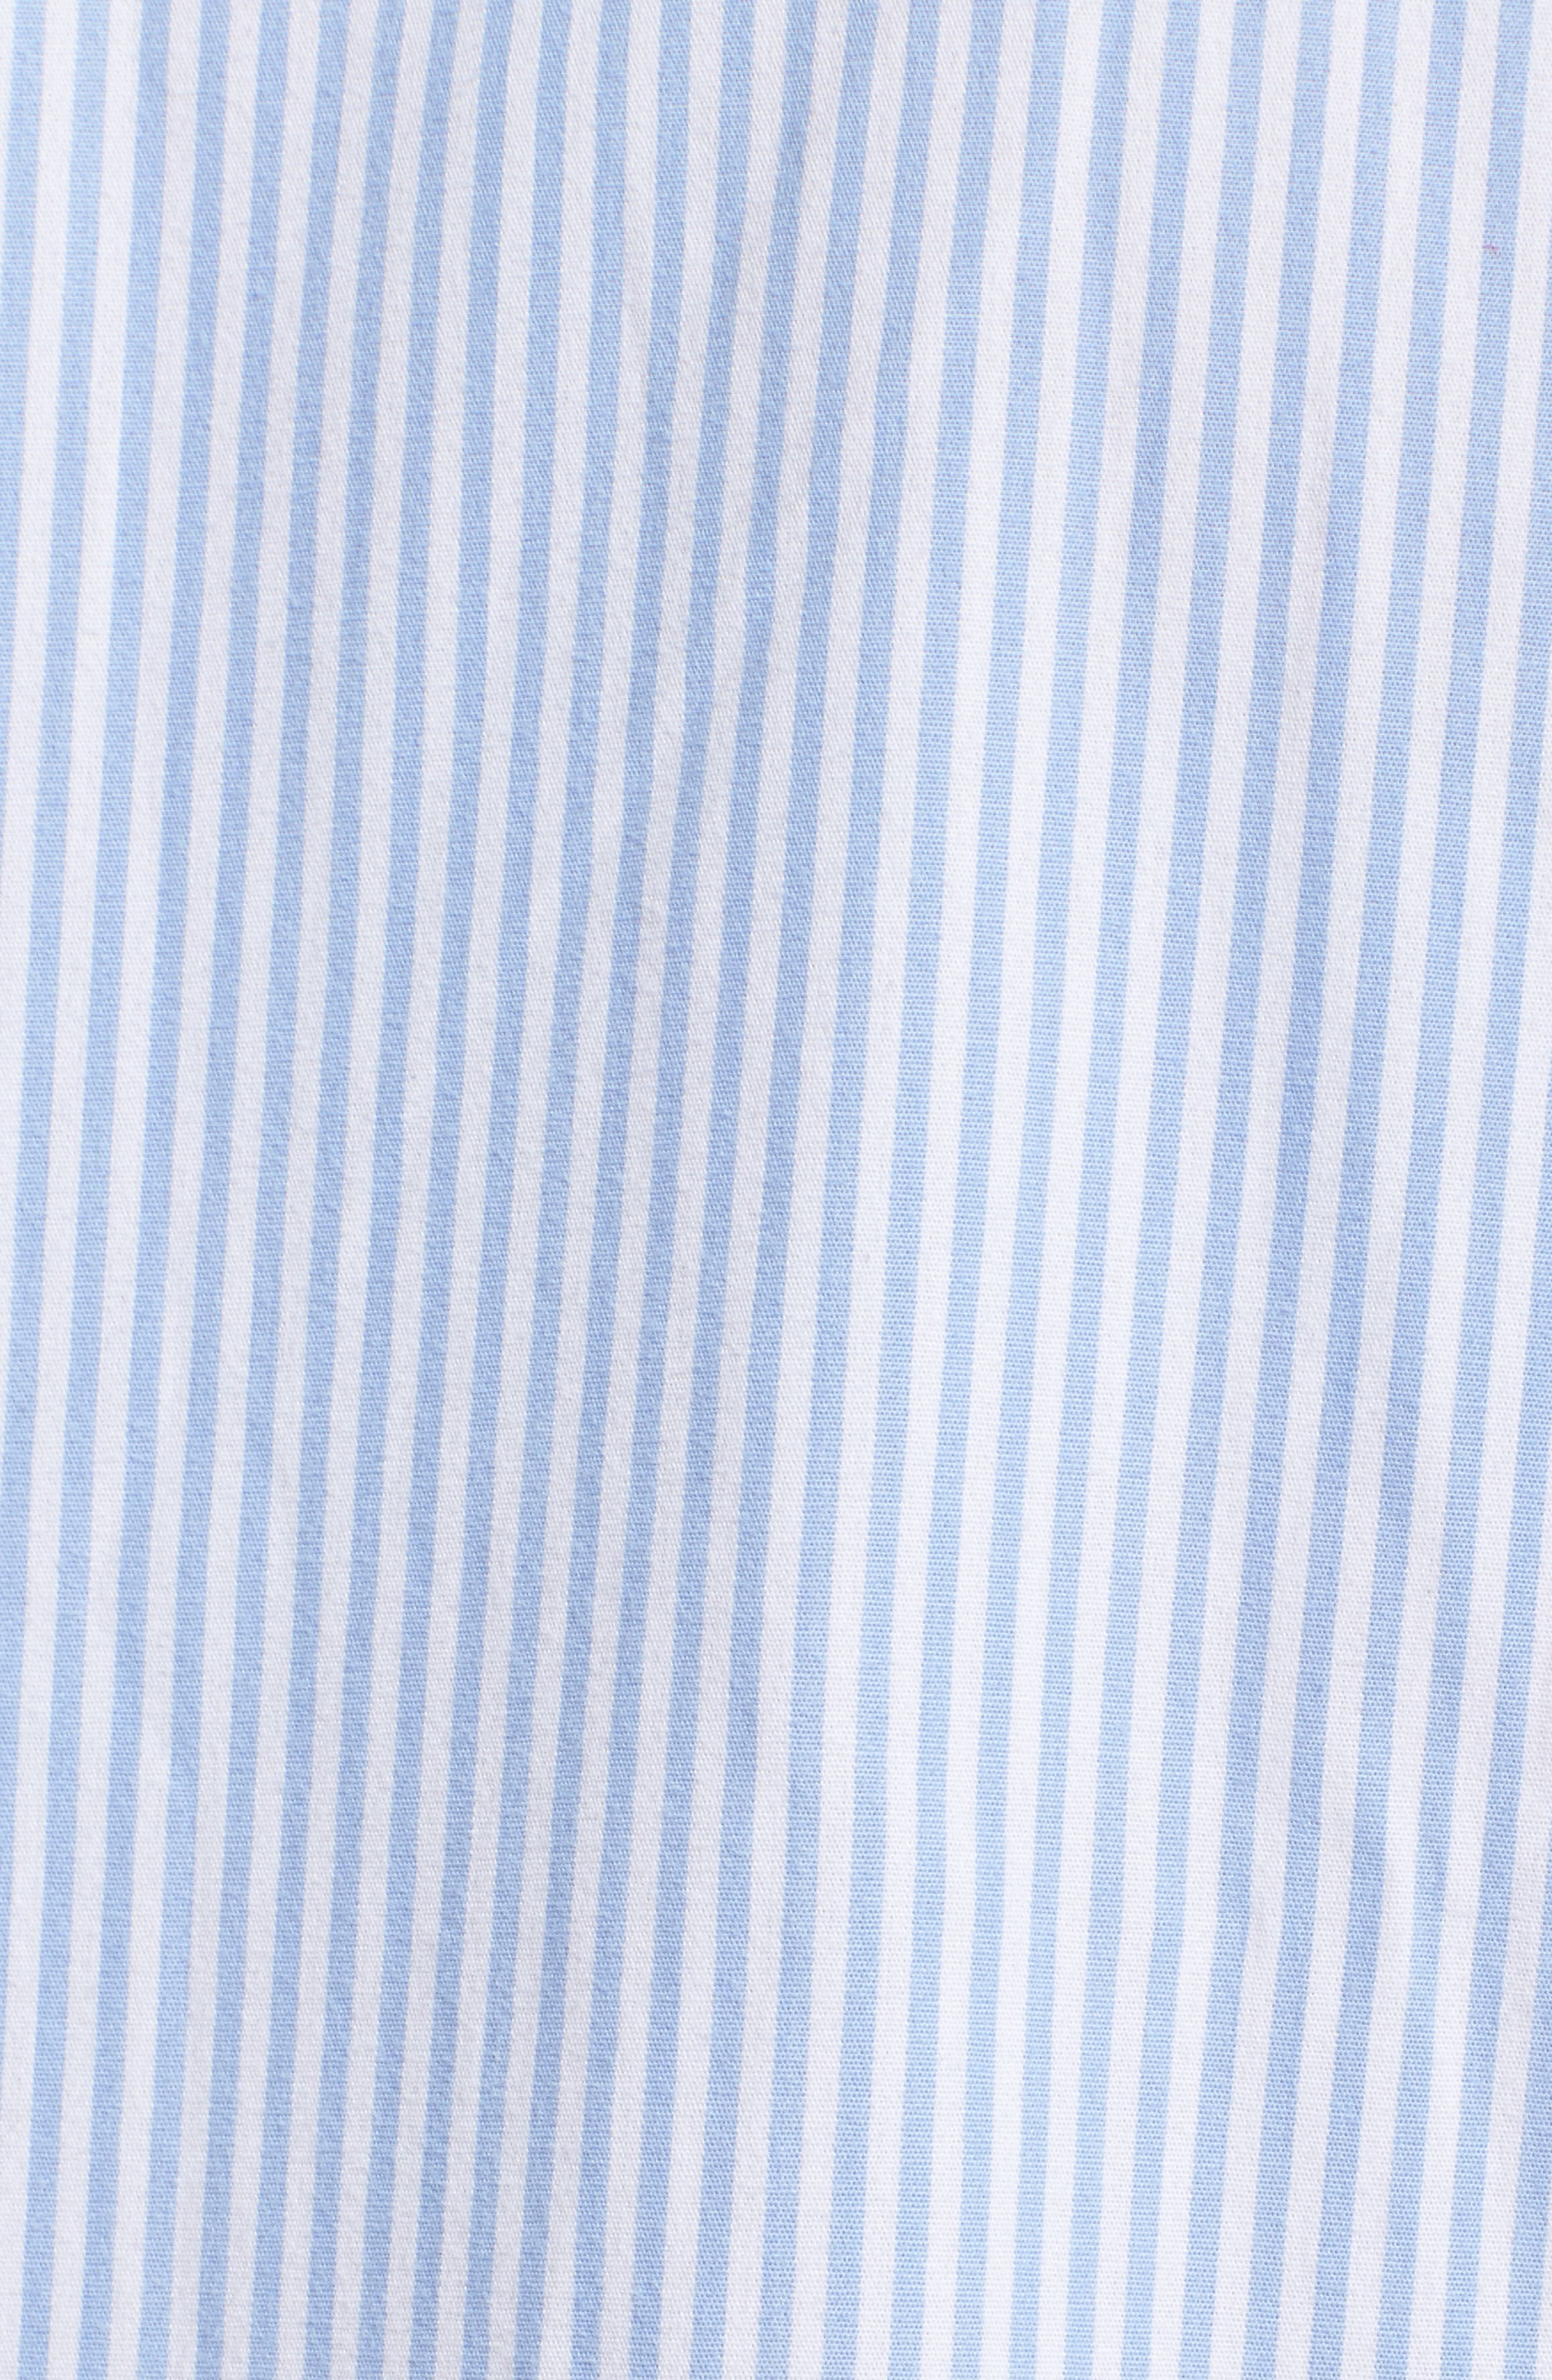 Sleep Shirt,                             Alternate thumbnail 5, color,                             Stripe French Blue/ White